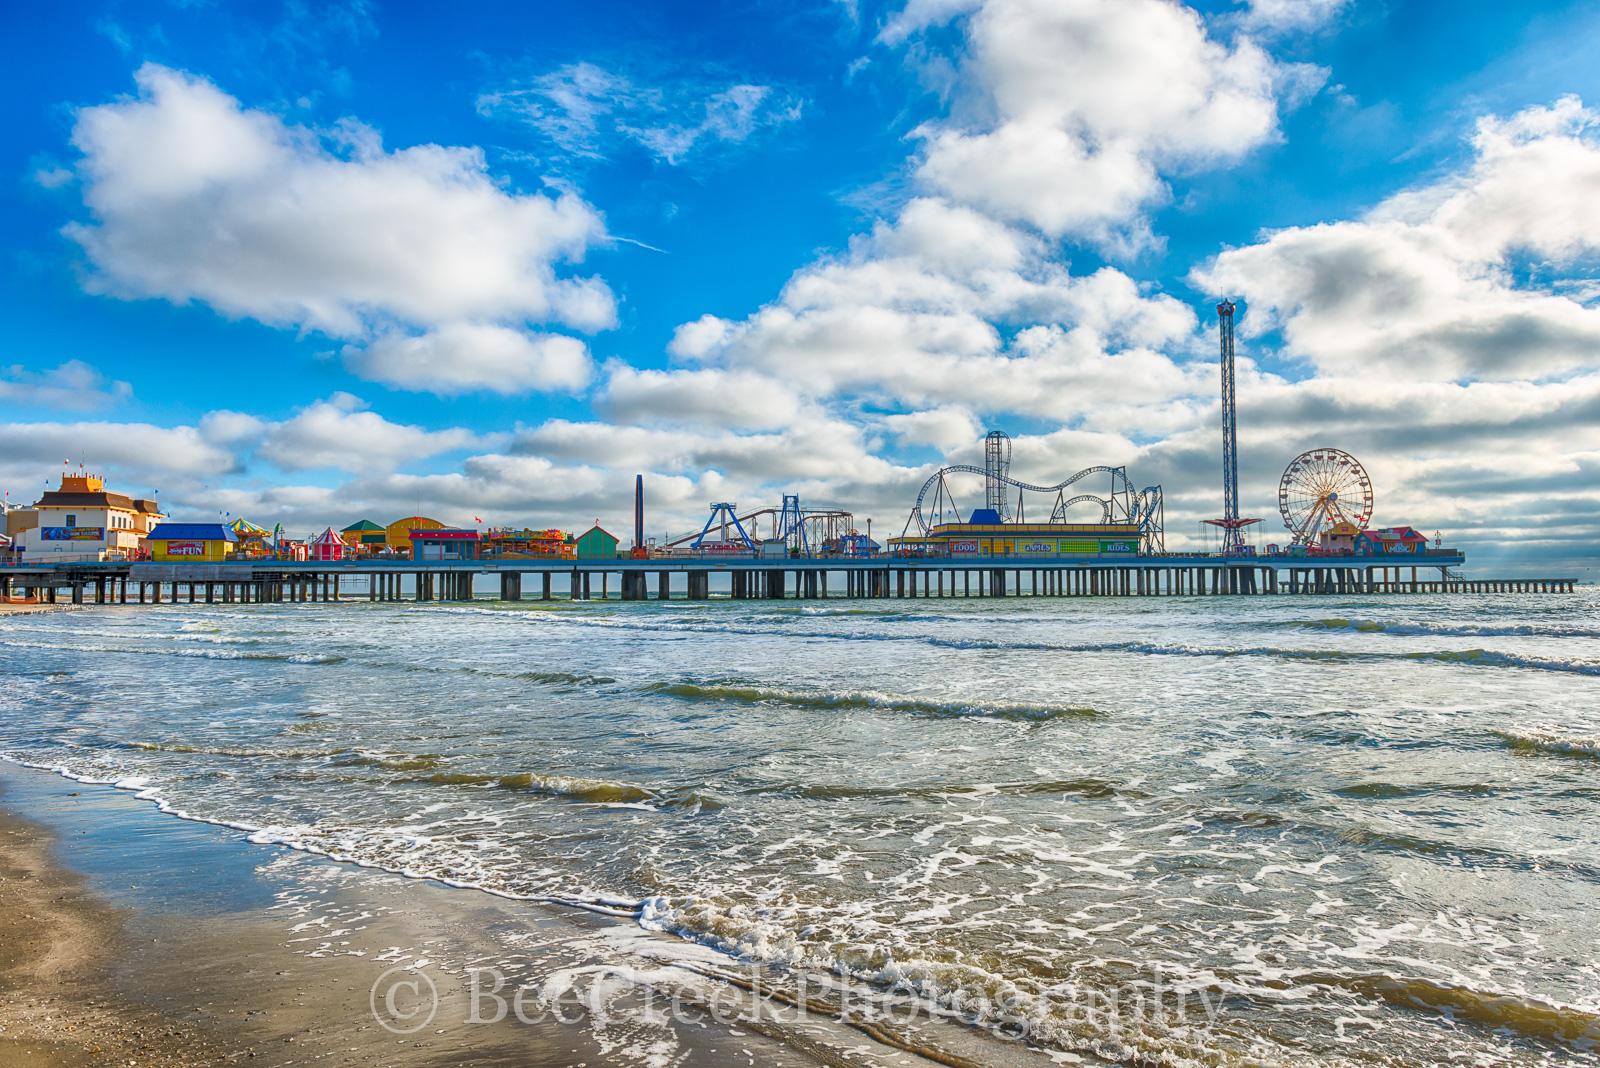 Galveston, Pleasure Pier, amusement park, beach, city, coast, family entertainment, island, party, seascape, tourist, water, gulf cost images, Texas beaches, photo